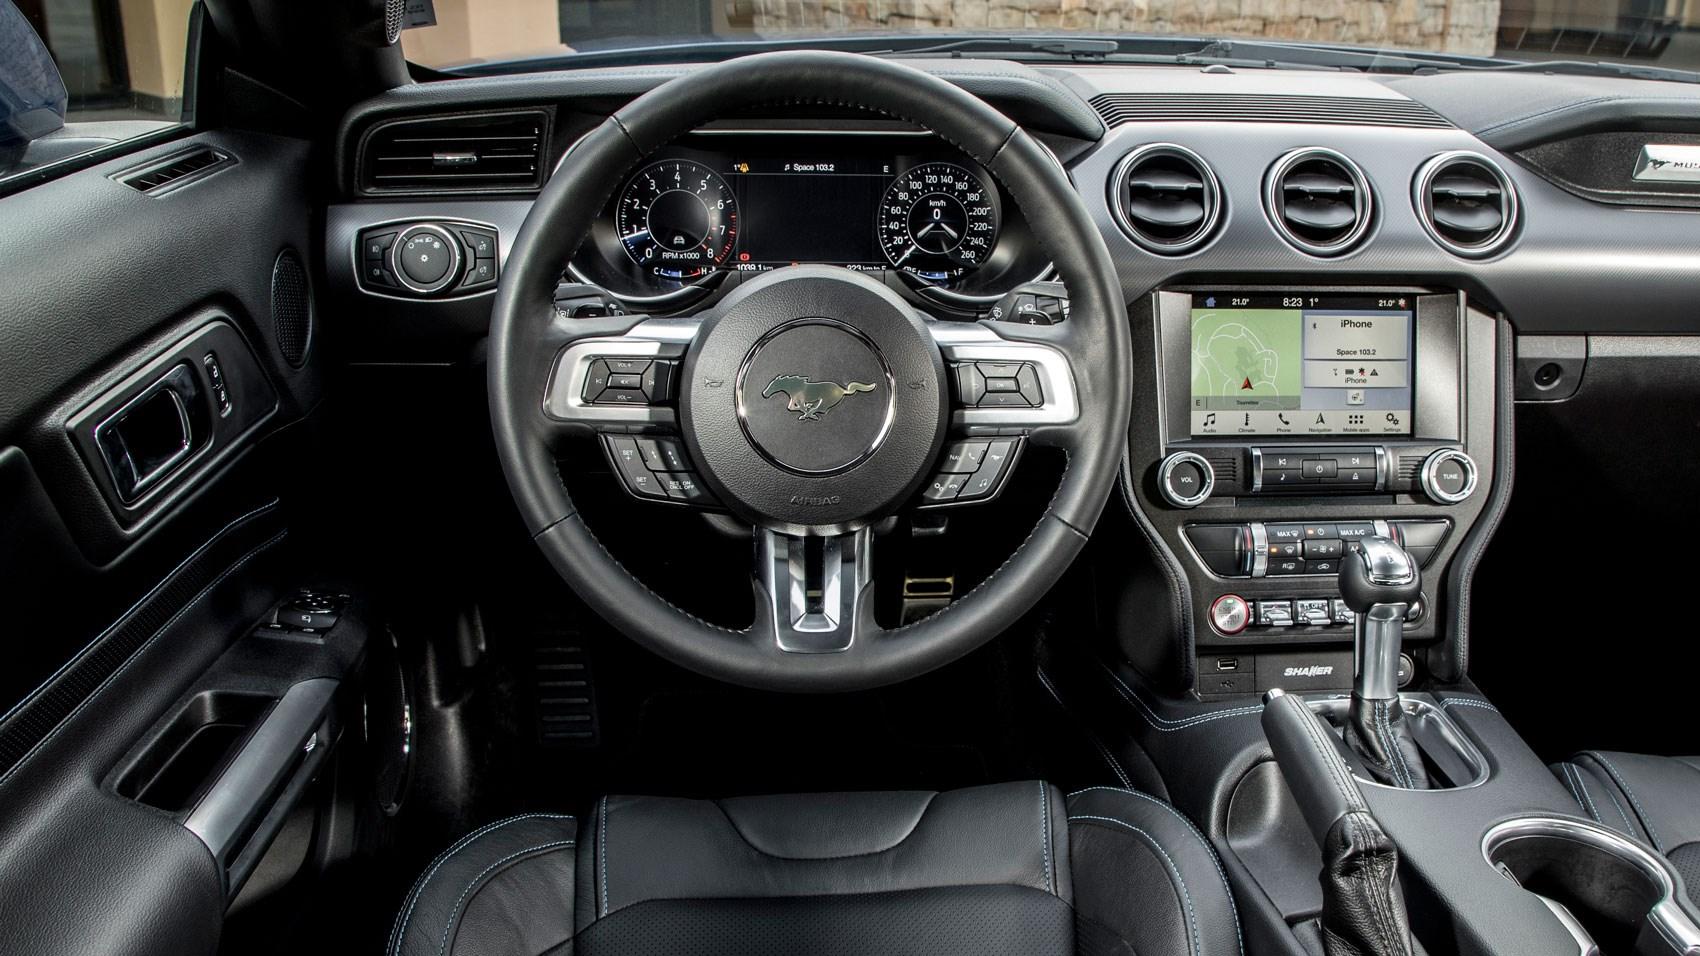 Тест-драйв Ford Mustang 2018 года 3